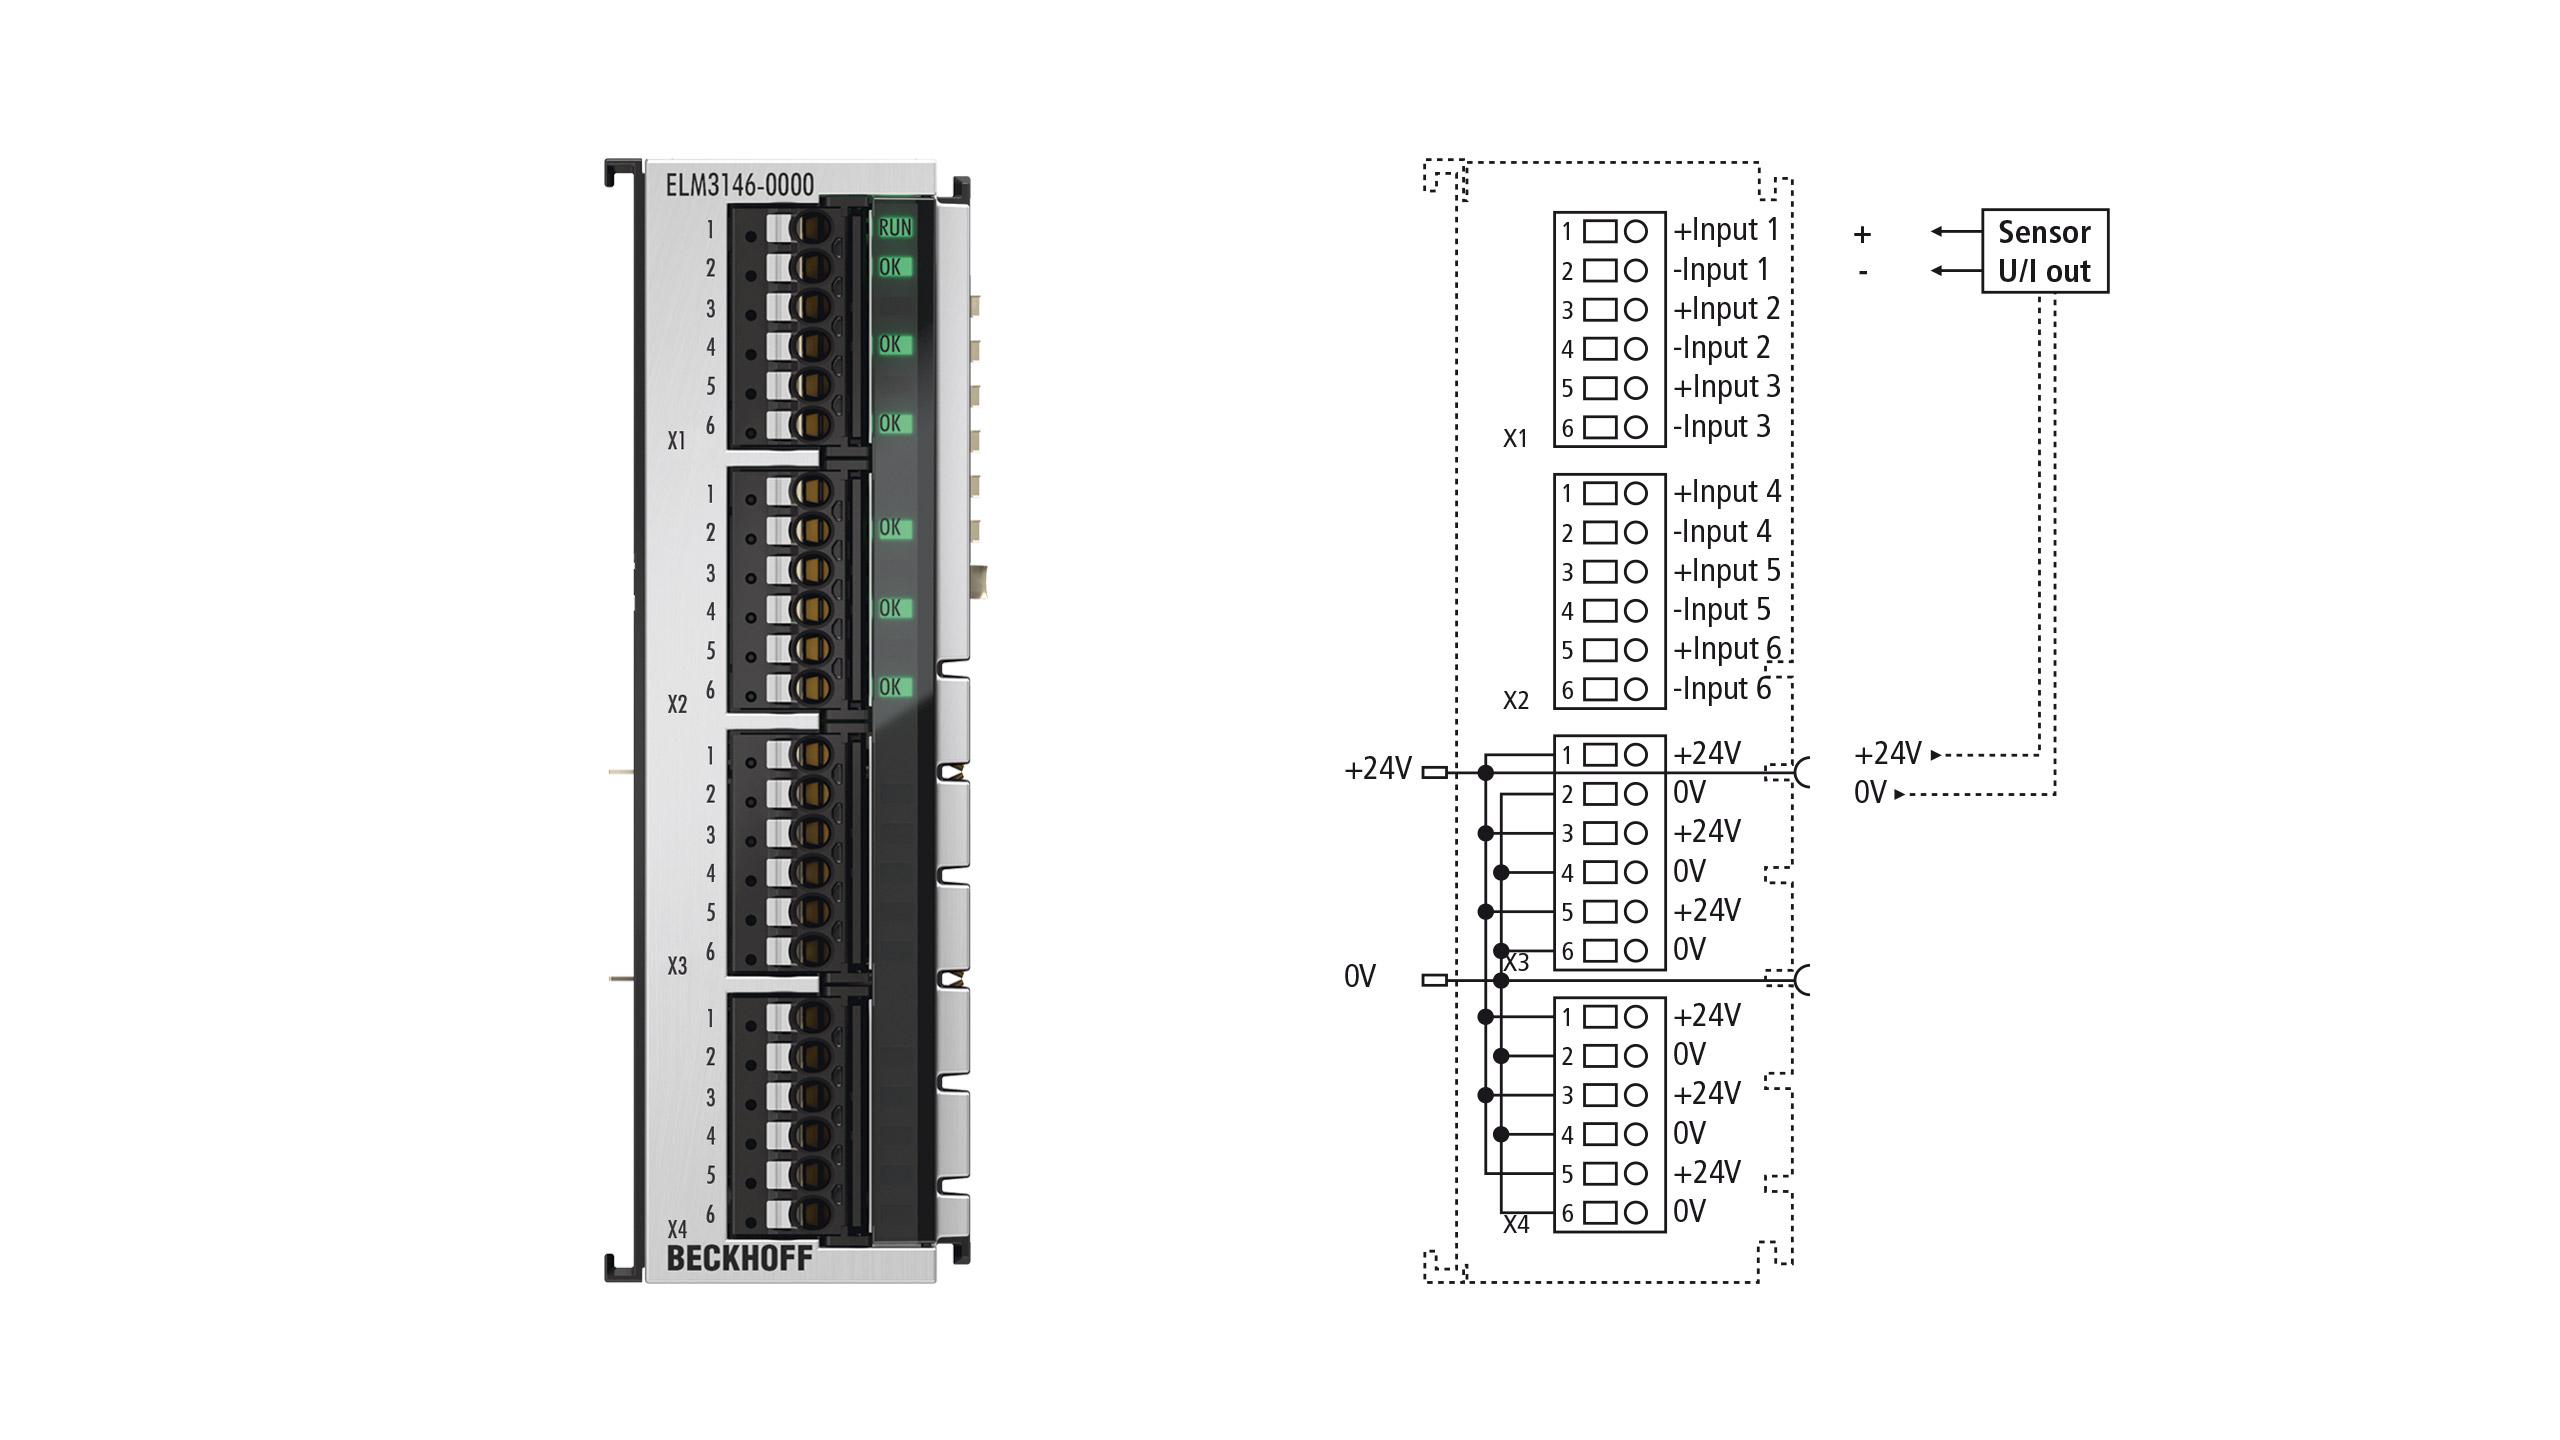 ELM3146-0000 | 6-Kanal-Analog-Eingang ±10…±1,25V, ±20mA, 24Bit, 1kSps